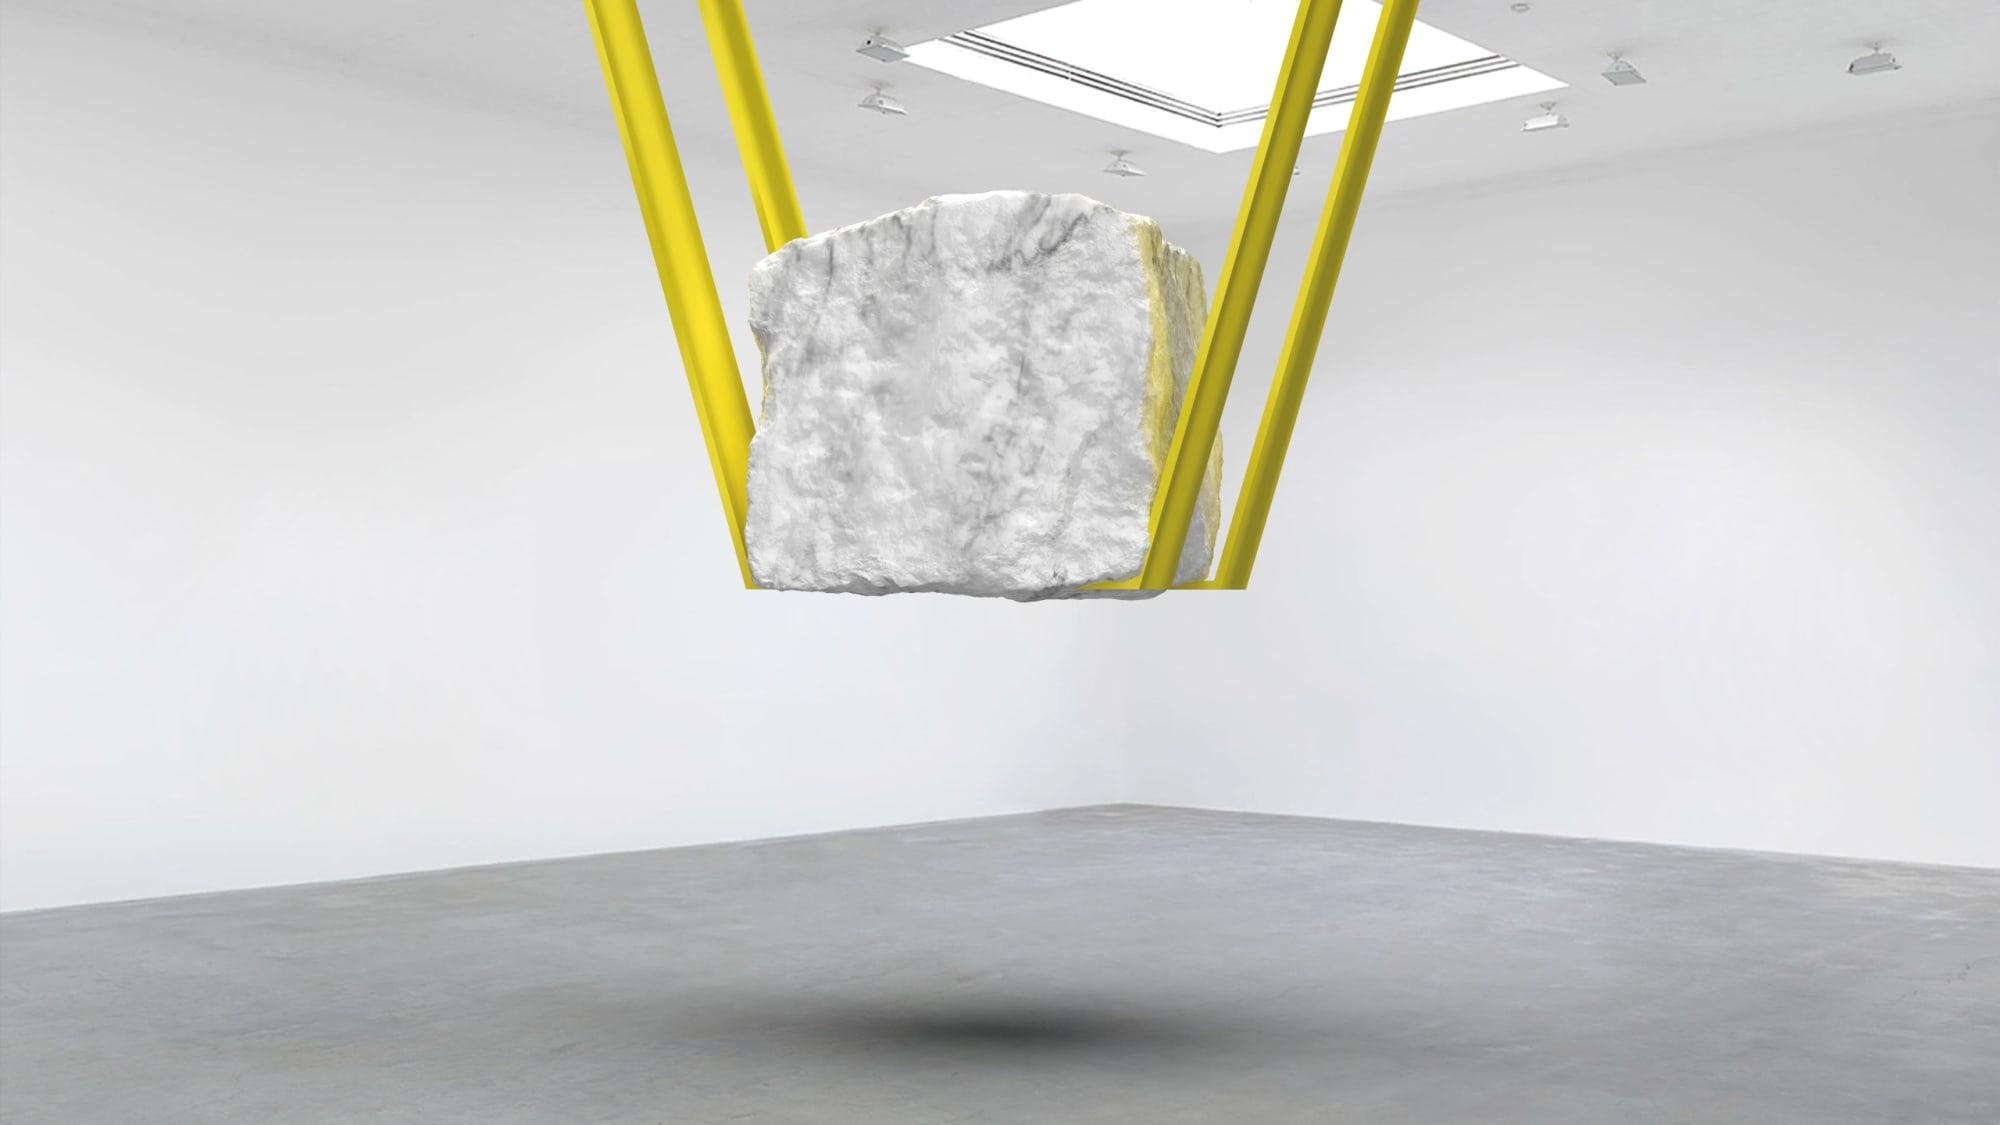 Suspended Marble Tension Sculpture: Work in progress